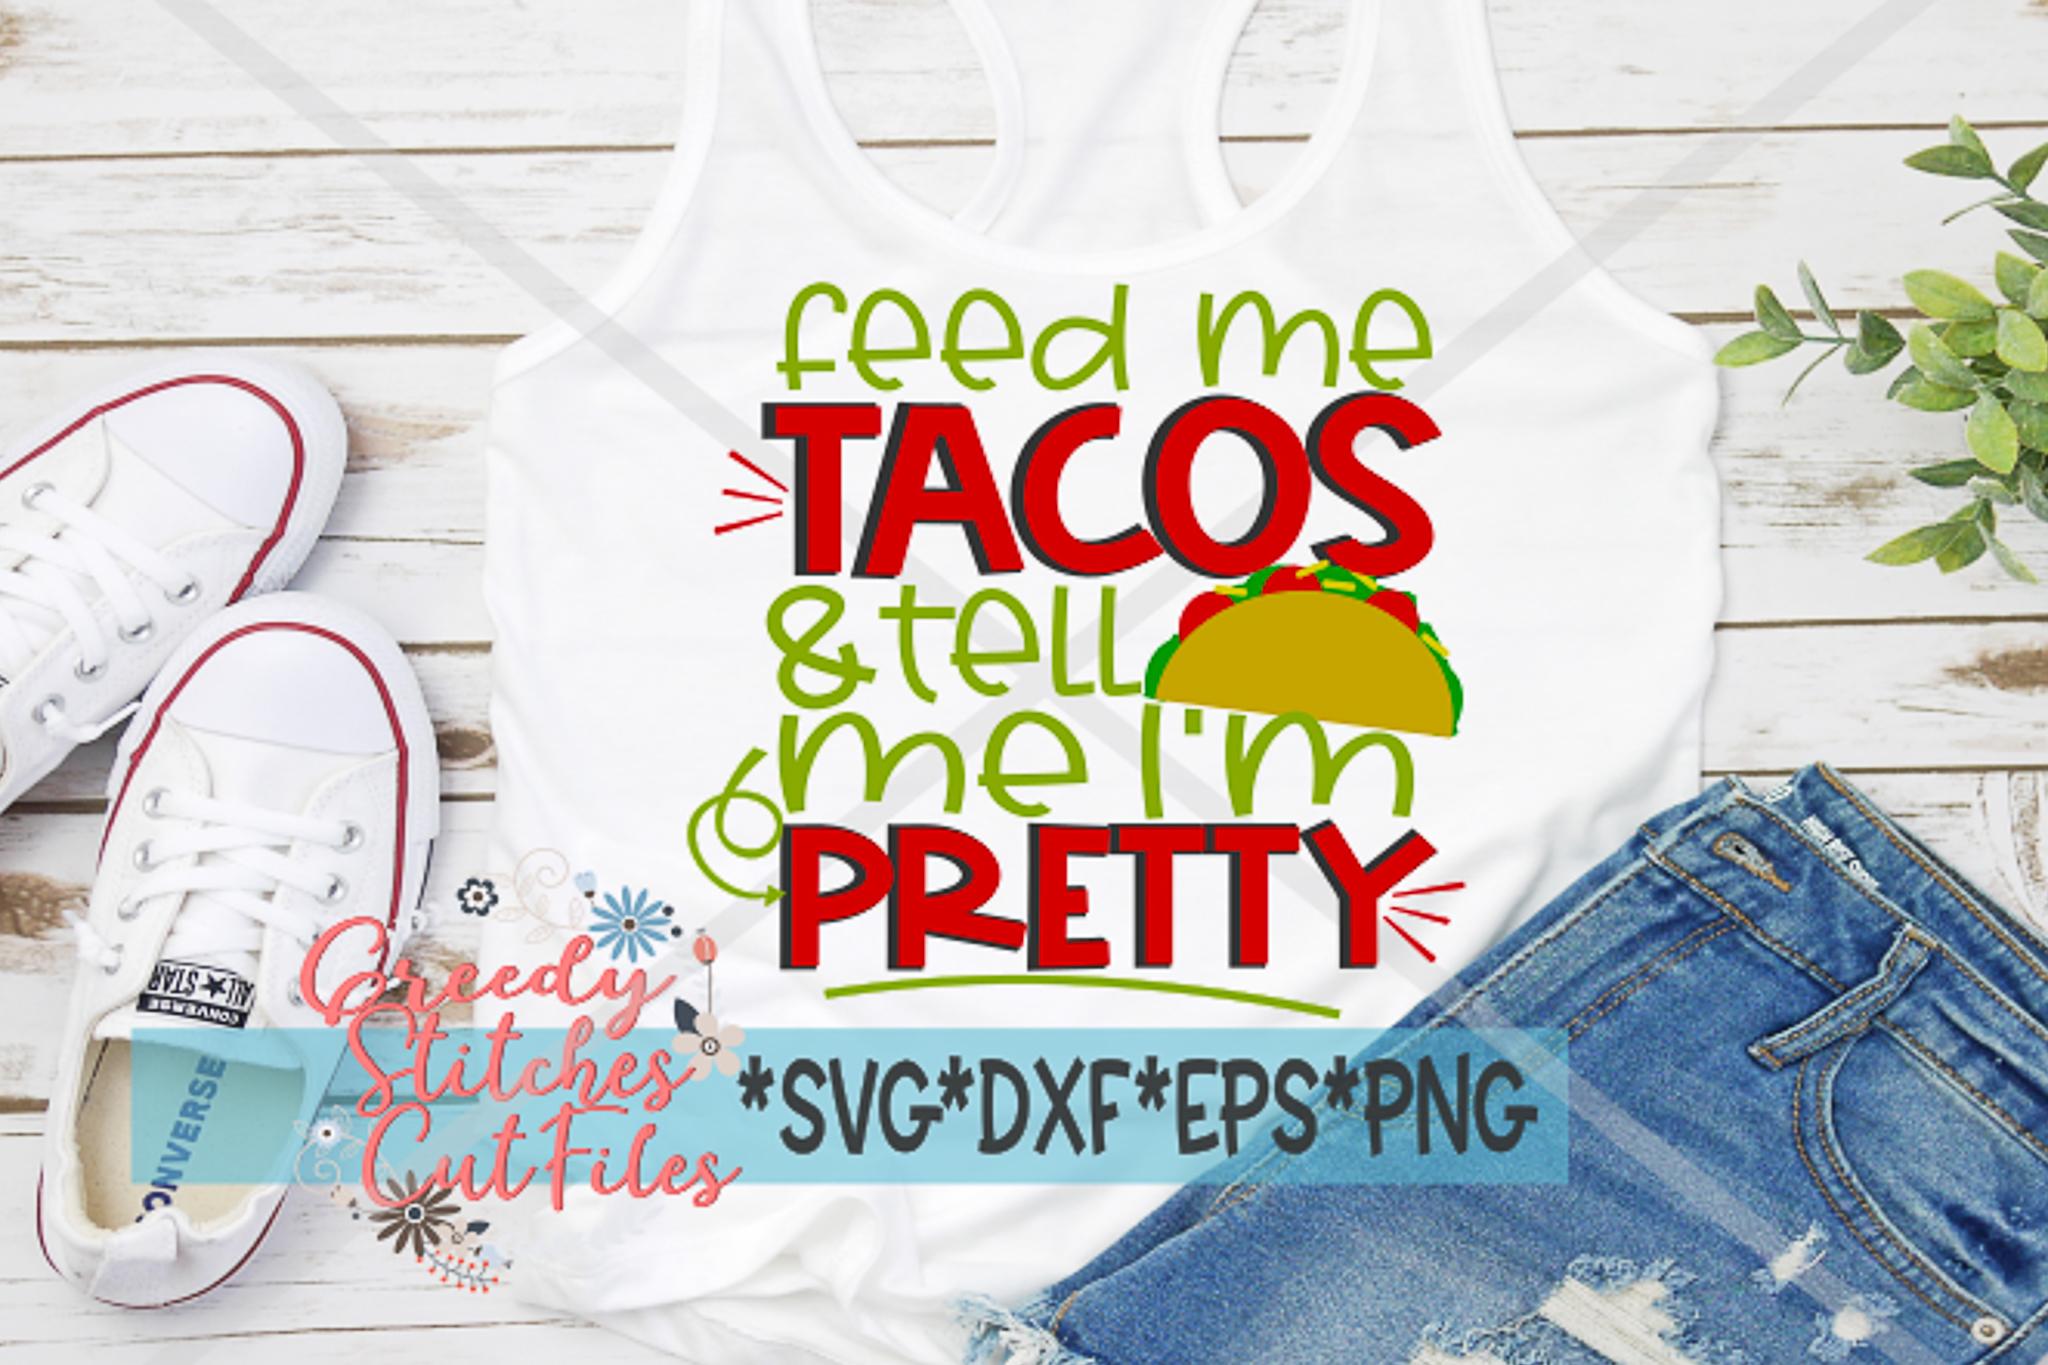 Cinco de Mayo | Feed Me Tacos & Tell Me I'm Pretty svg example image 3